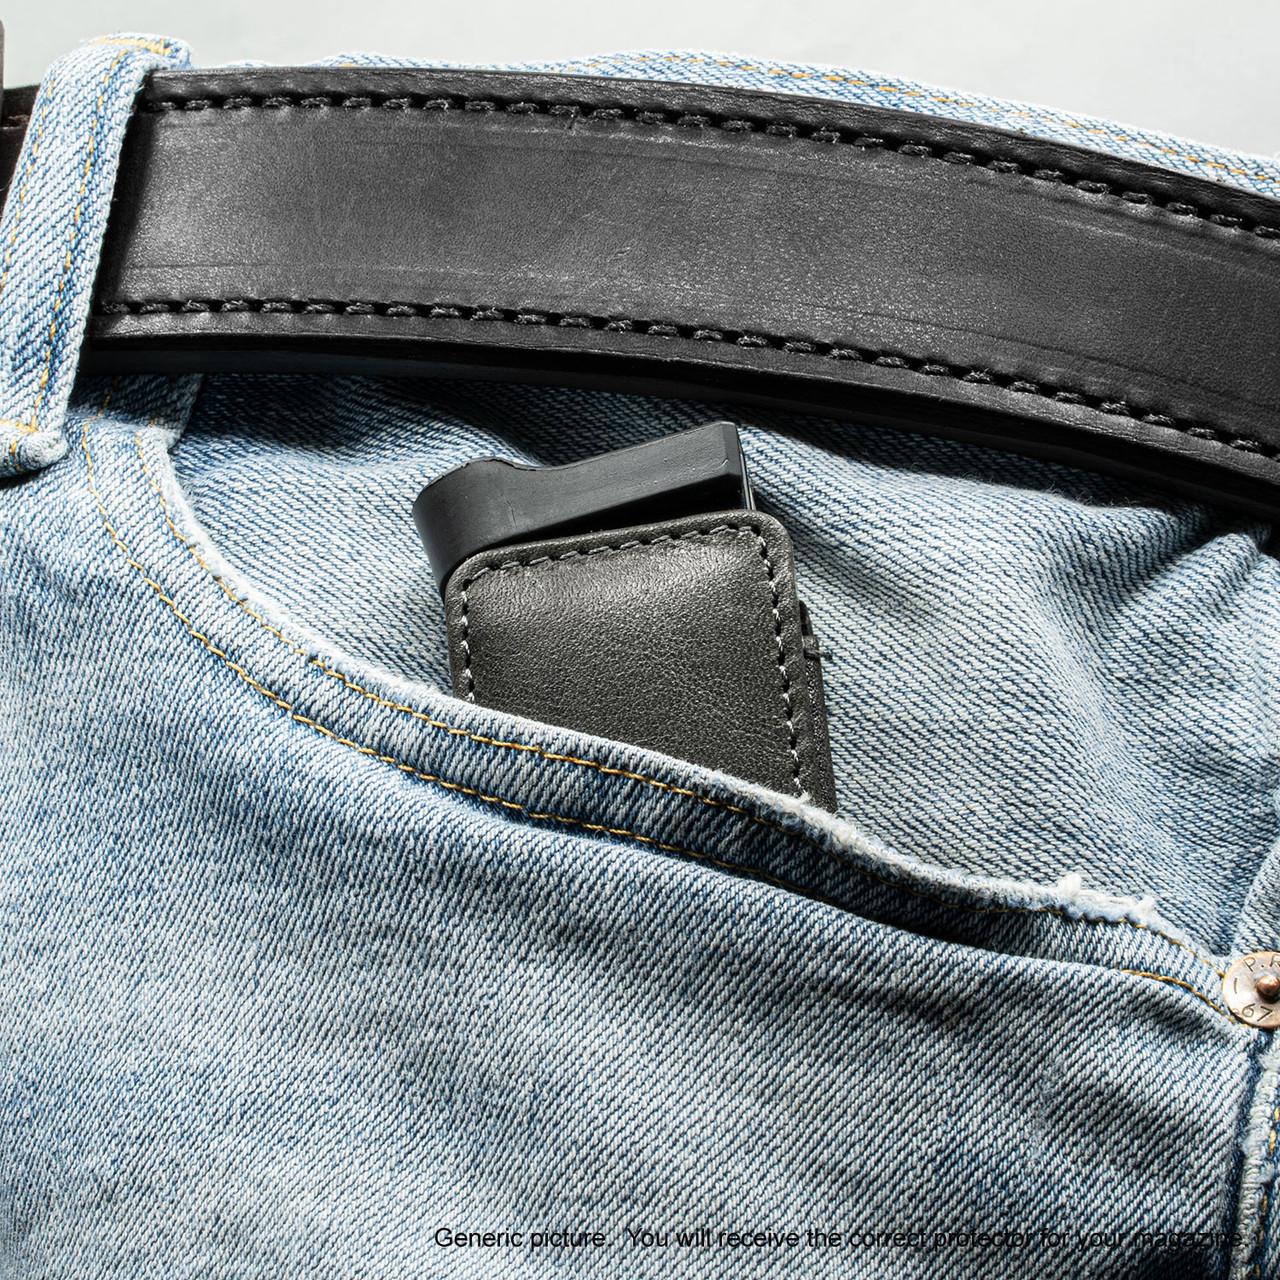 Sig P365 XL Black Freedom Magazine Pocket Protector